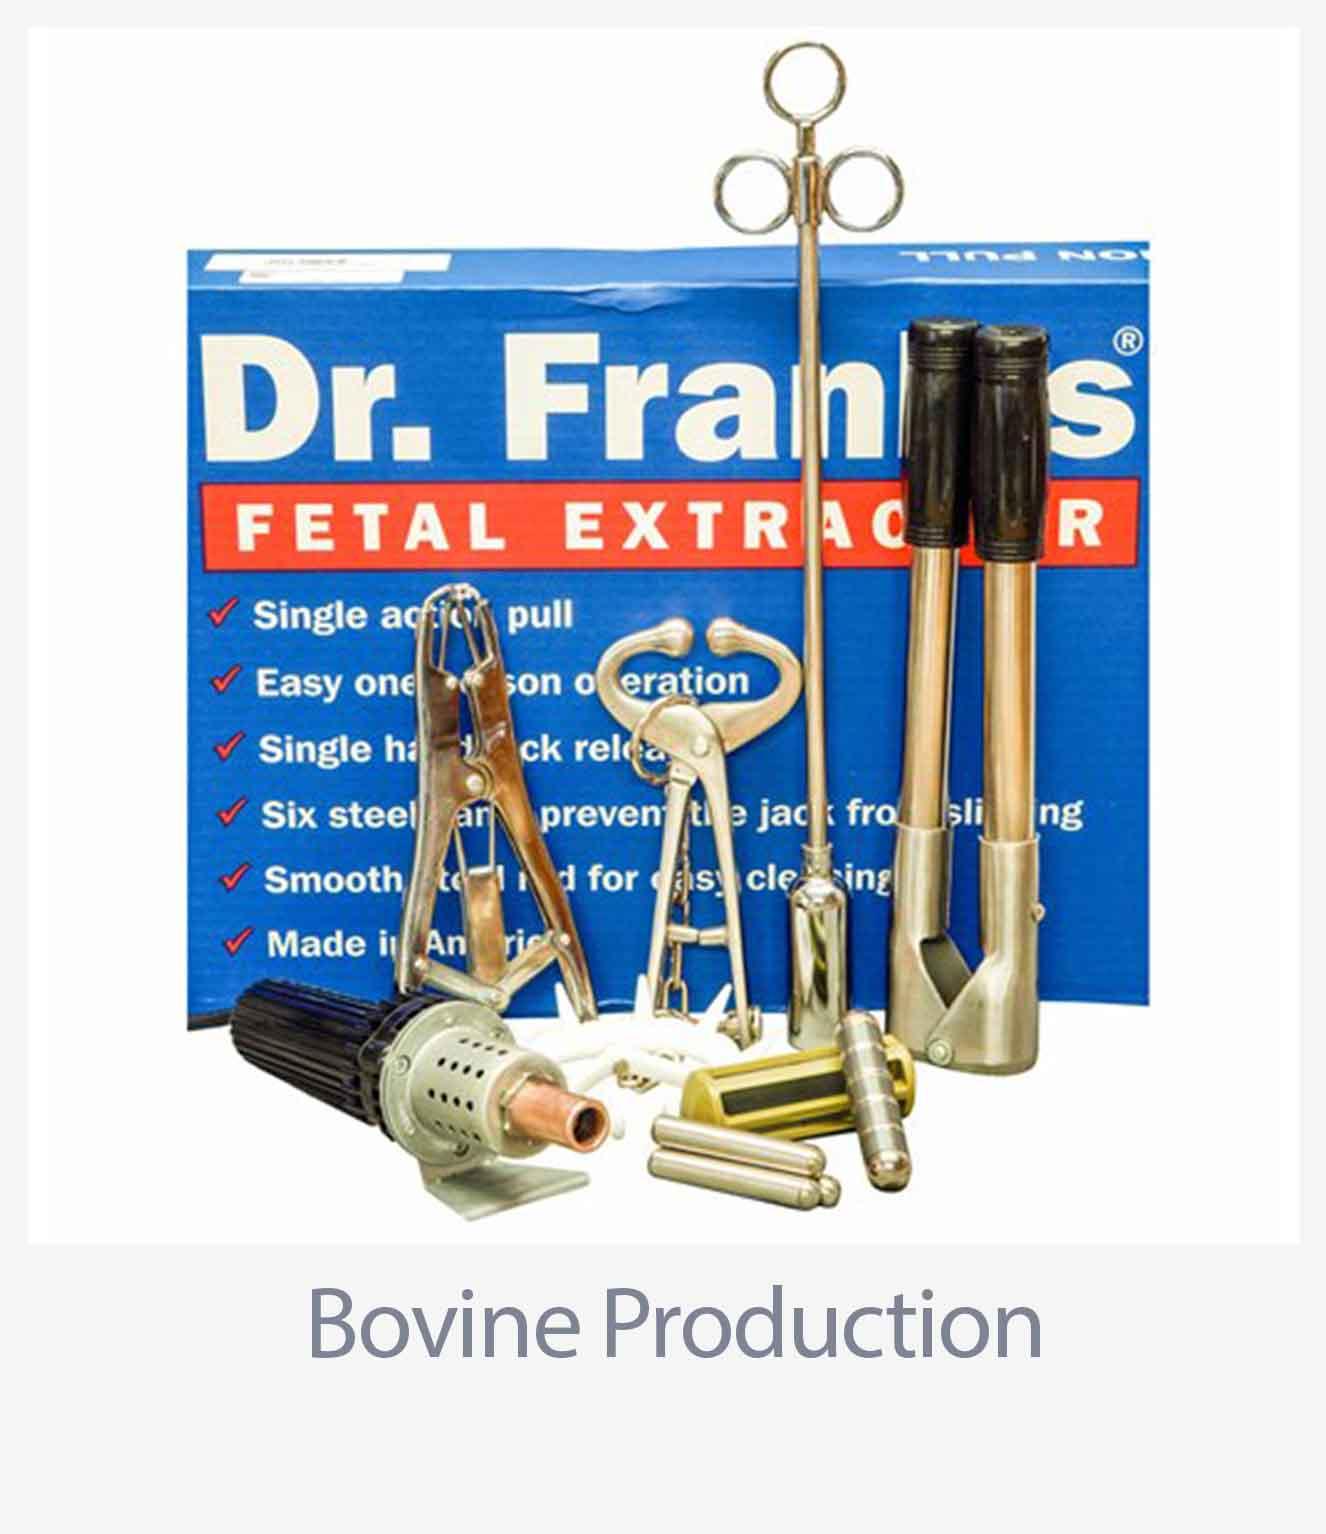 Bovine Production